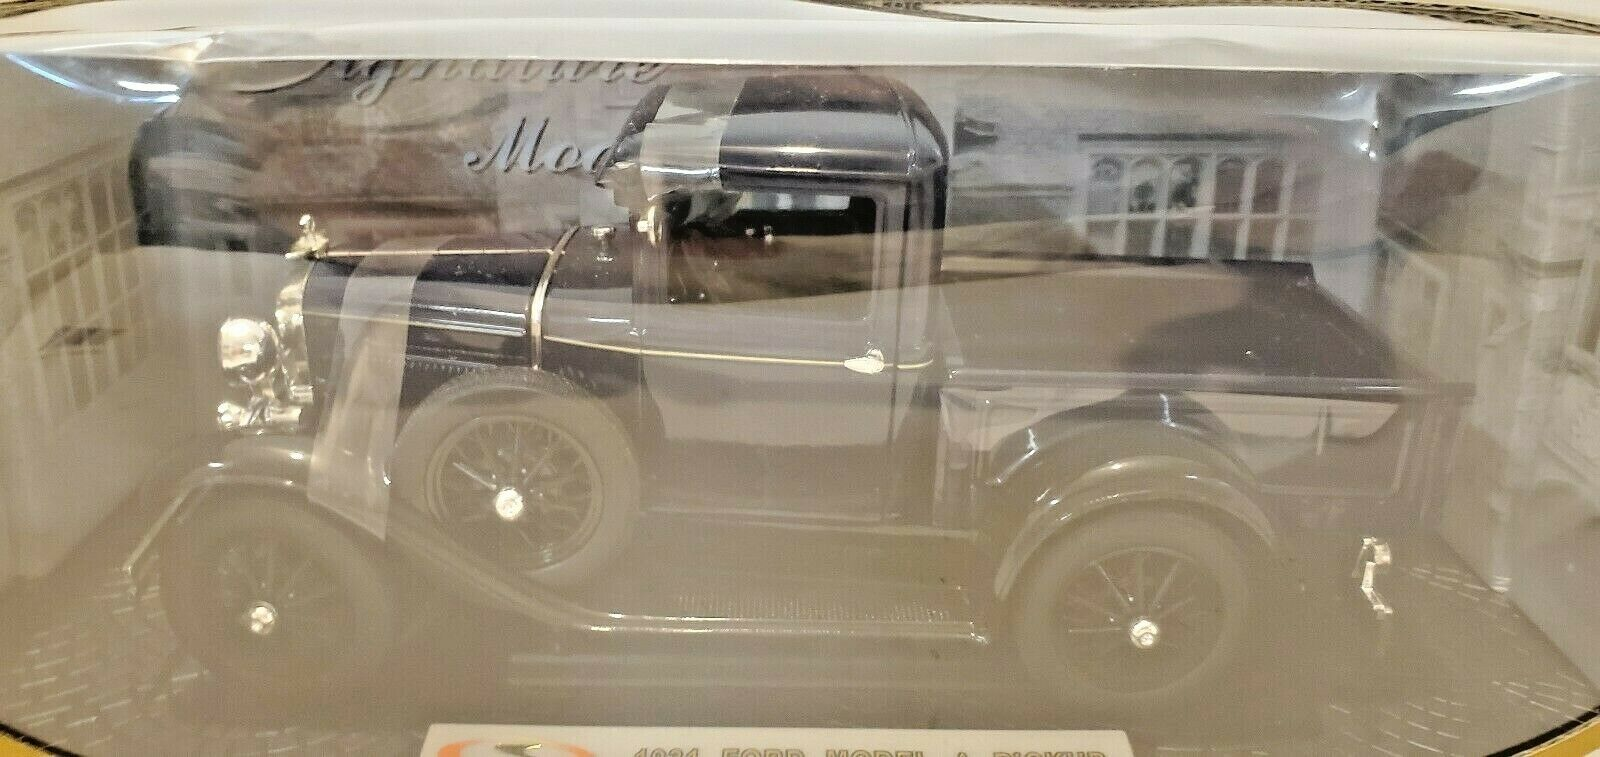 Signature Models nuevo 1931 Ford modelo una camioneta de Coloreee blu oscuro de 1 18 Modelo 18113